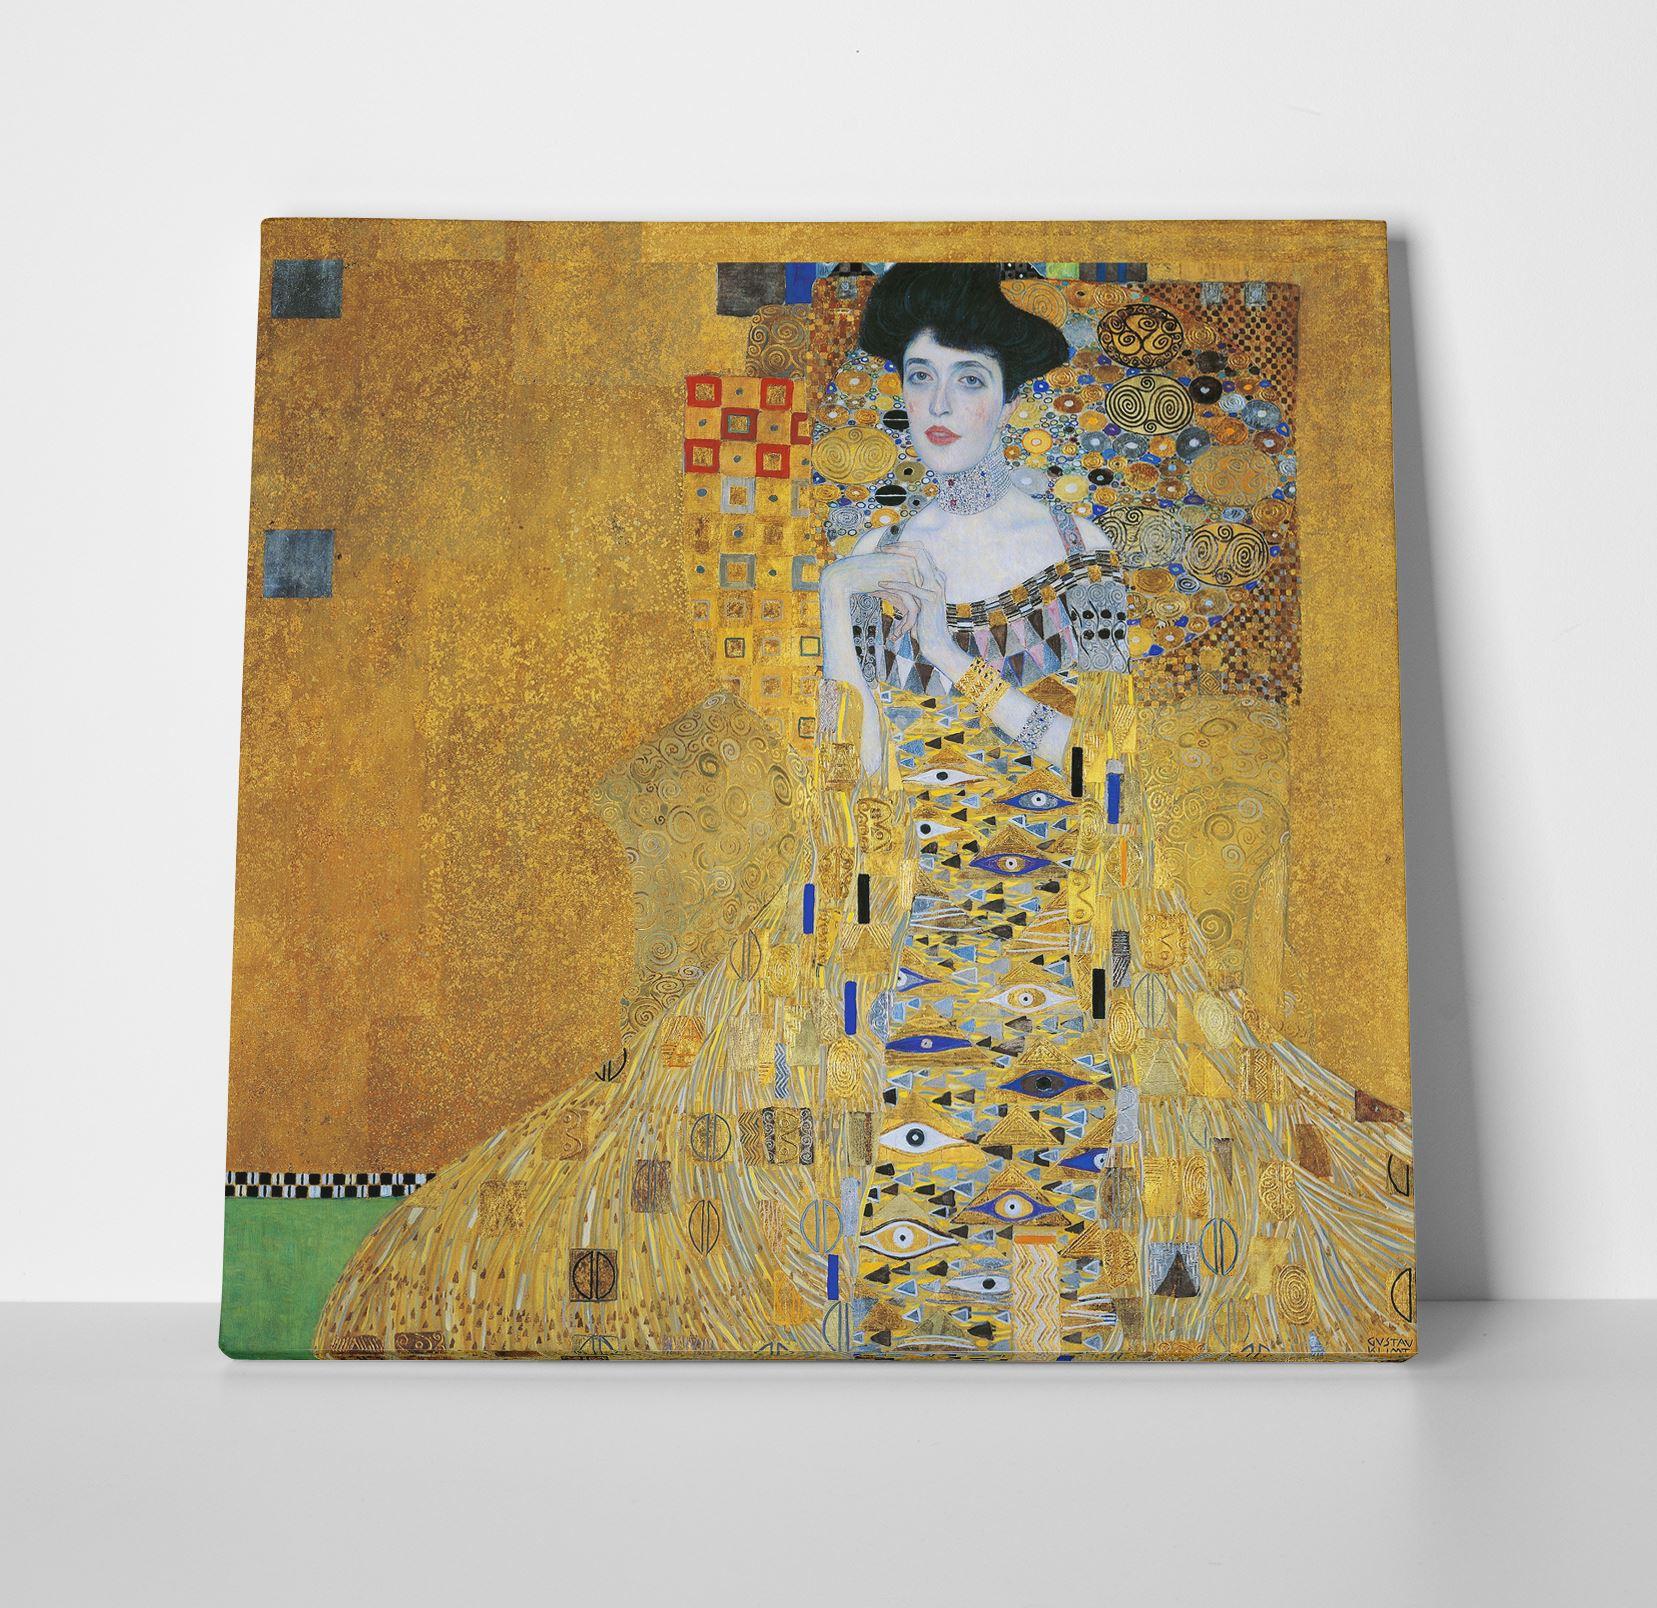 Gustav Klimt Adele Box Canvas Print Wall Art - Choice of Sizes   eBay